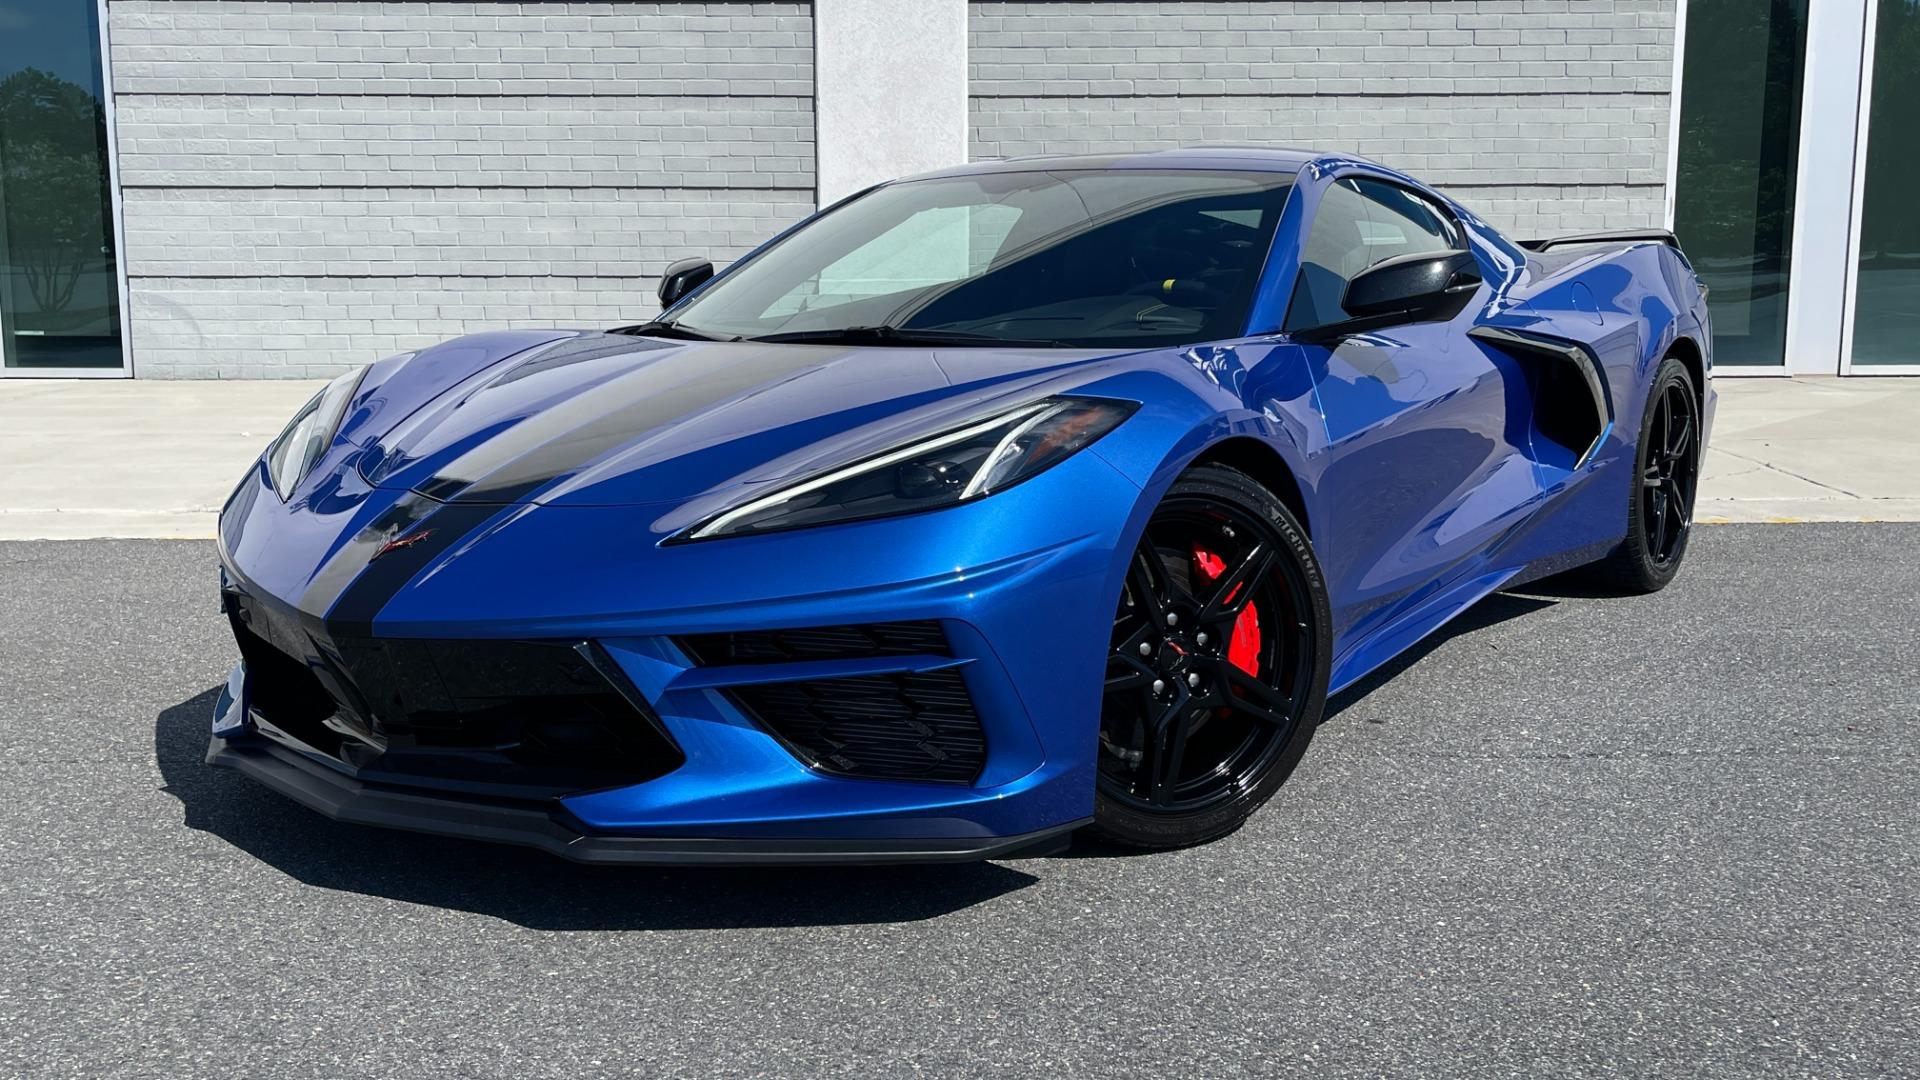 Used 2021 Chevrolet CORVETTE STINGRAY 3LT COUPE / 8-SPD / PERF PKG / NAV / BOSE / REARVIEW for sale $110,995 at Formula Imports in Charlotte NC 28227 11